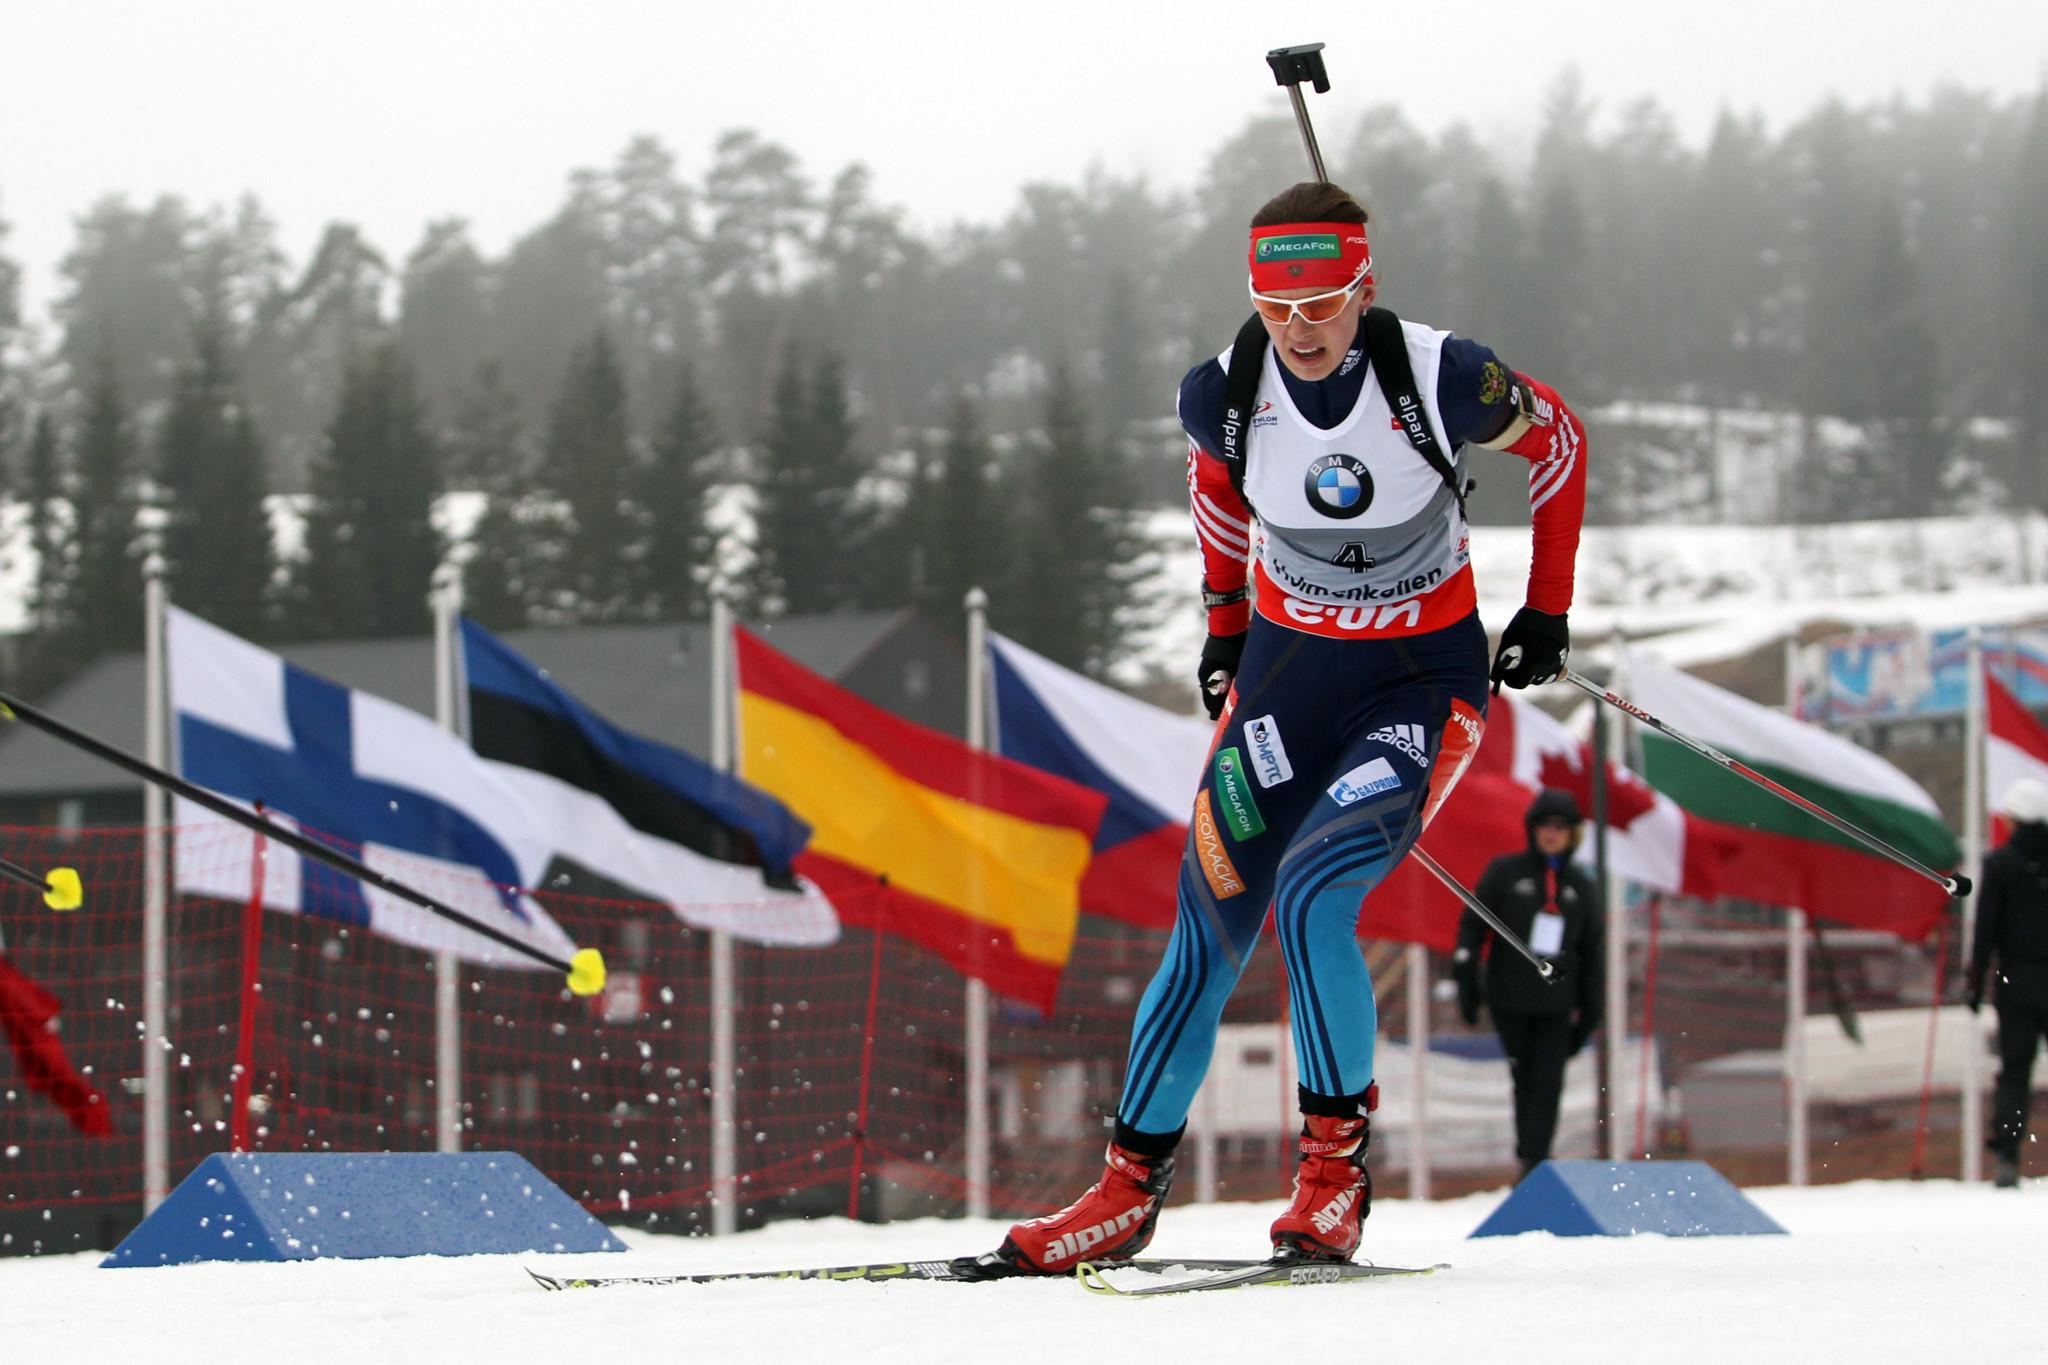 CAS overturned the life ban of Russian biathlete Olga Vilukhina last week ©Getty Images